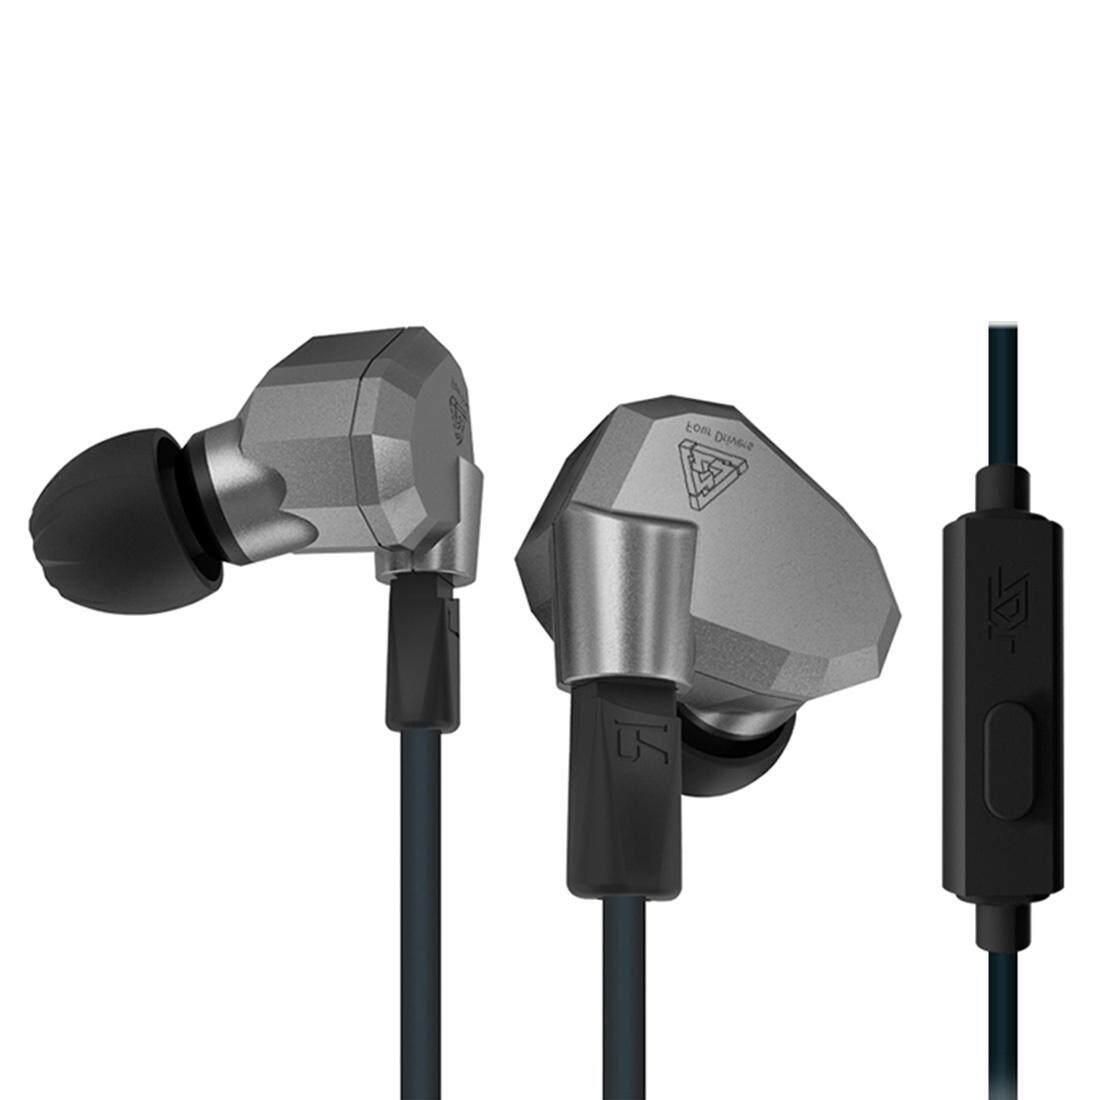 KZ ZS5 1.2 M 3.5 มม.หูแขวนกีฬาออกแบบชนิดใส่ในหูการควบคุมสายหูฟัง,สำหรับ iPhone,iPad, GALAXY,Huawei,Xiaomi,LG,HTC และสมาร์ทโฟนอื่นๆ (สีฟ้า)